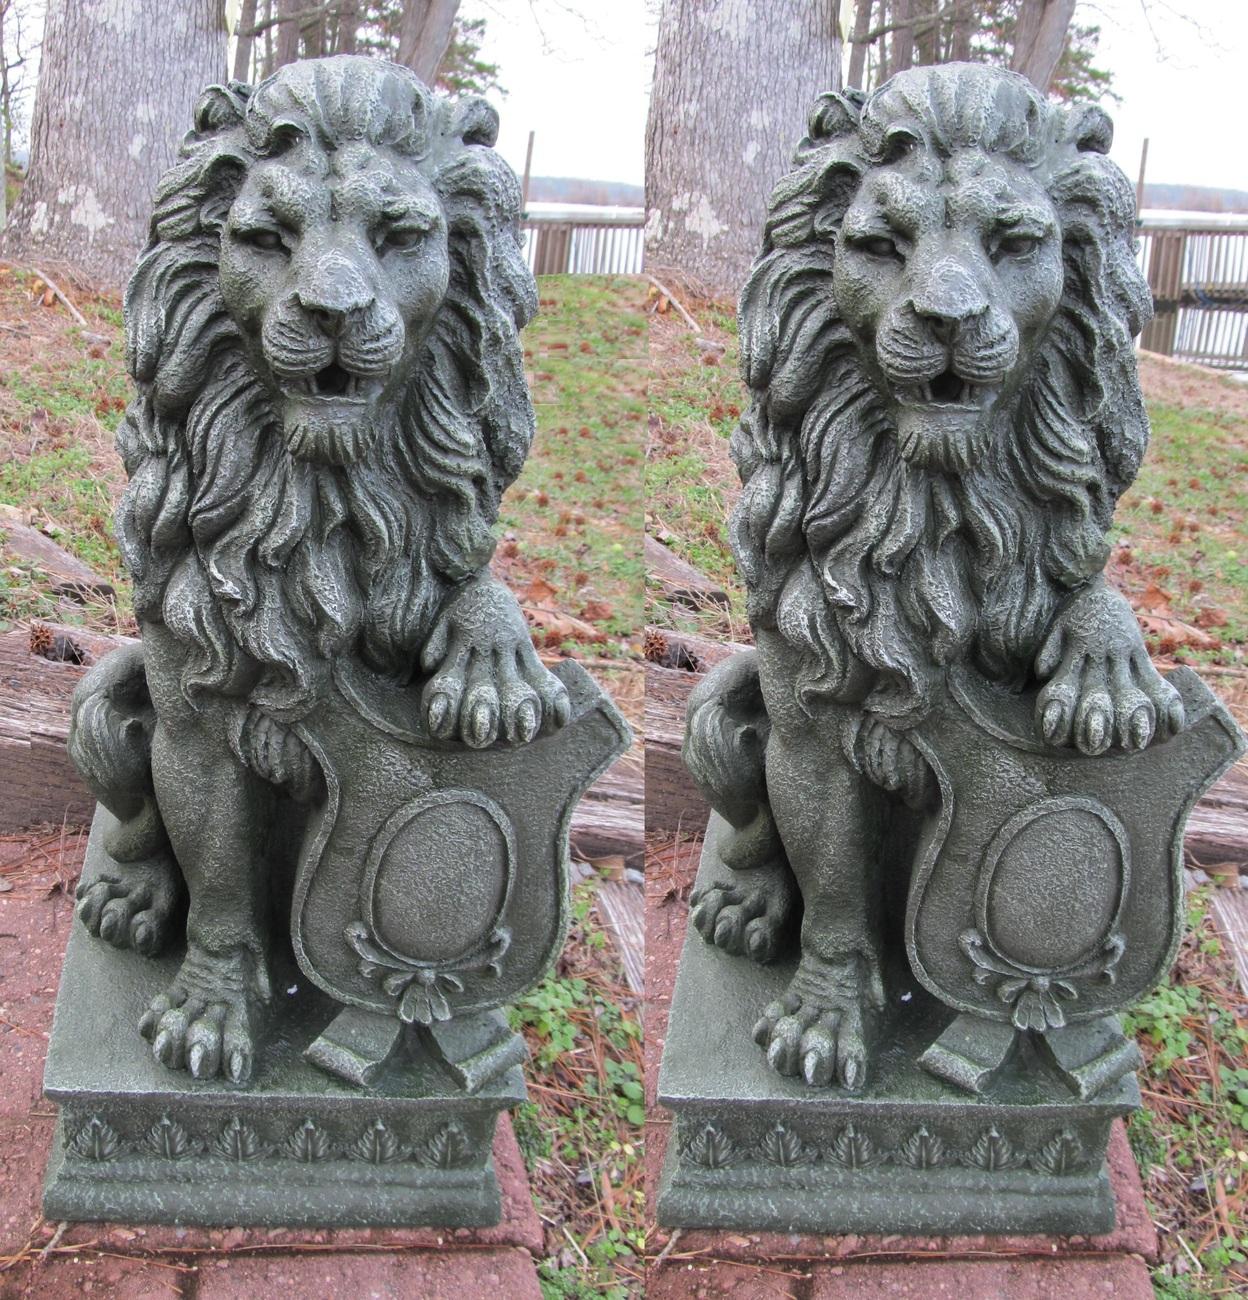 2 Lion Garden Driveway Figurine Statue Pair 25 Tall